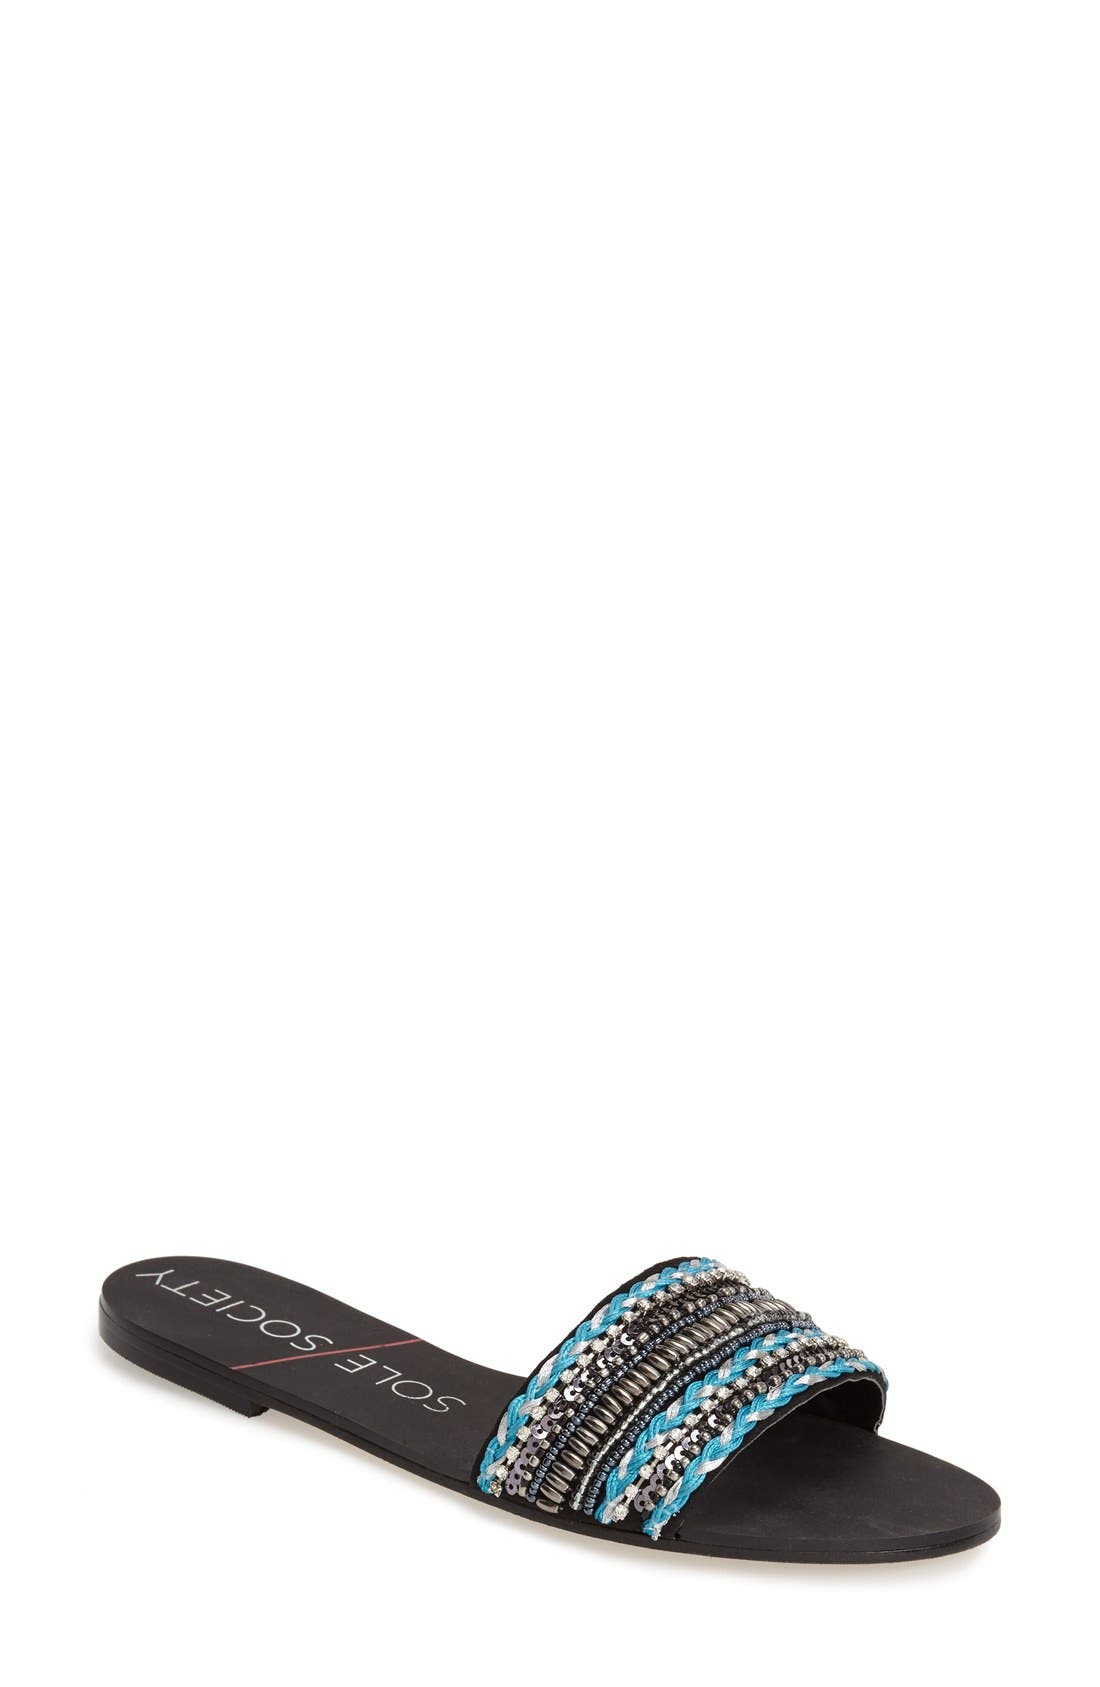 SOLE SOCIETY 'Eliana' Slide Sandal, Main, color, 001